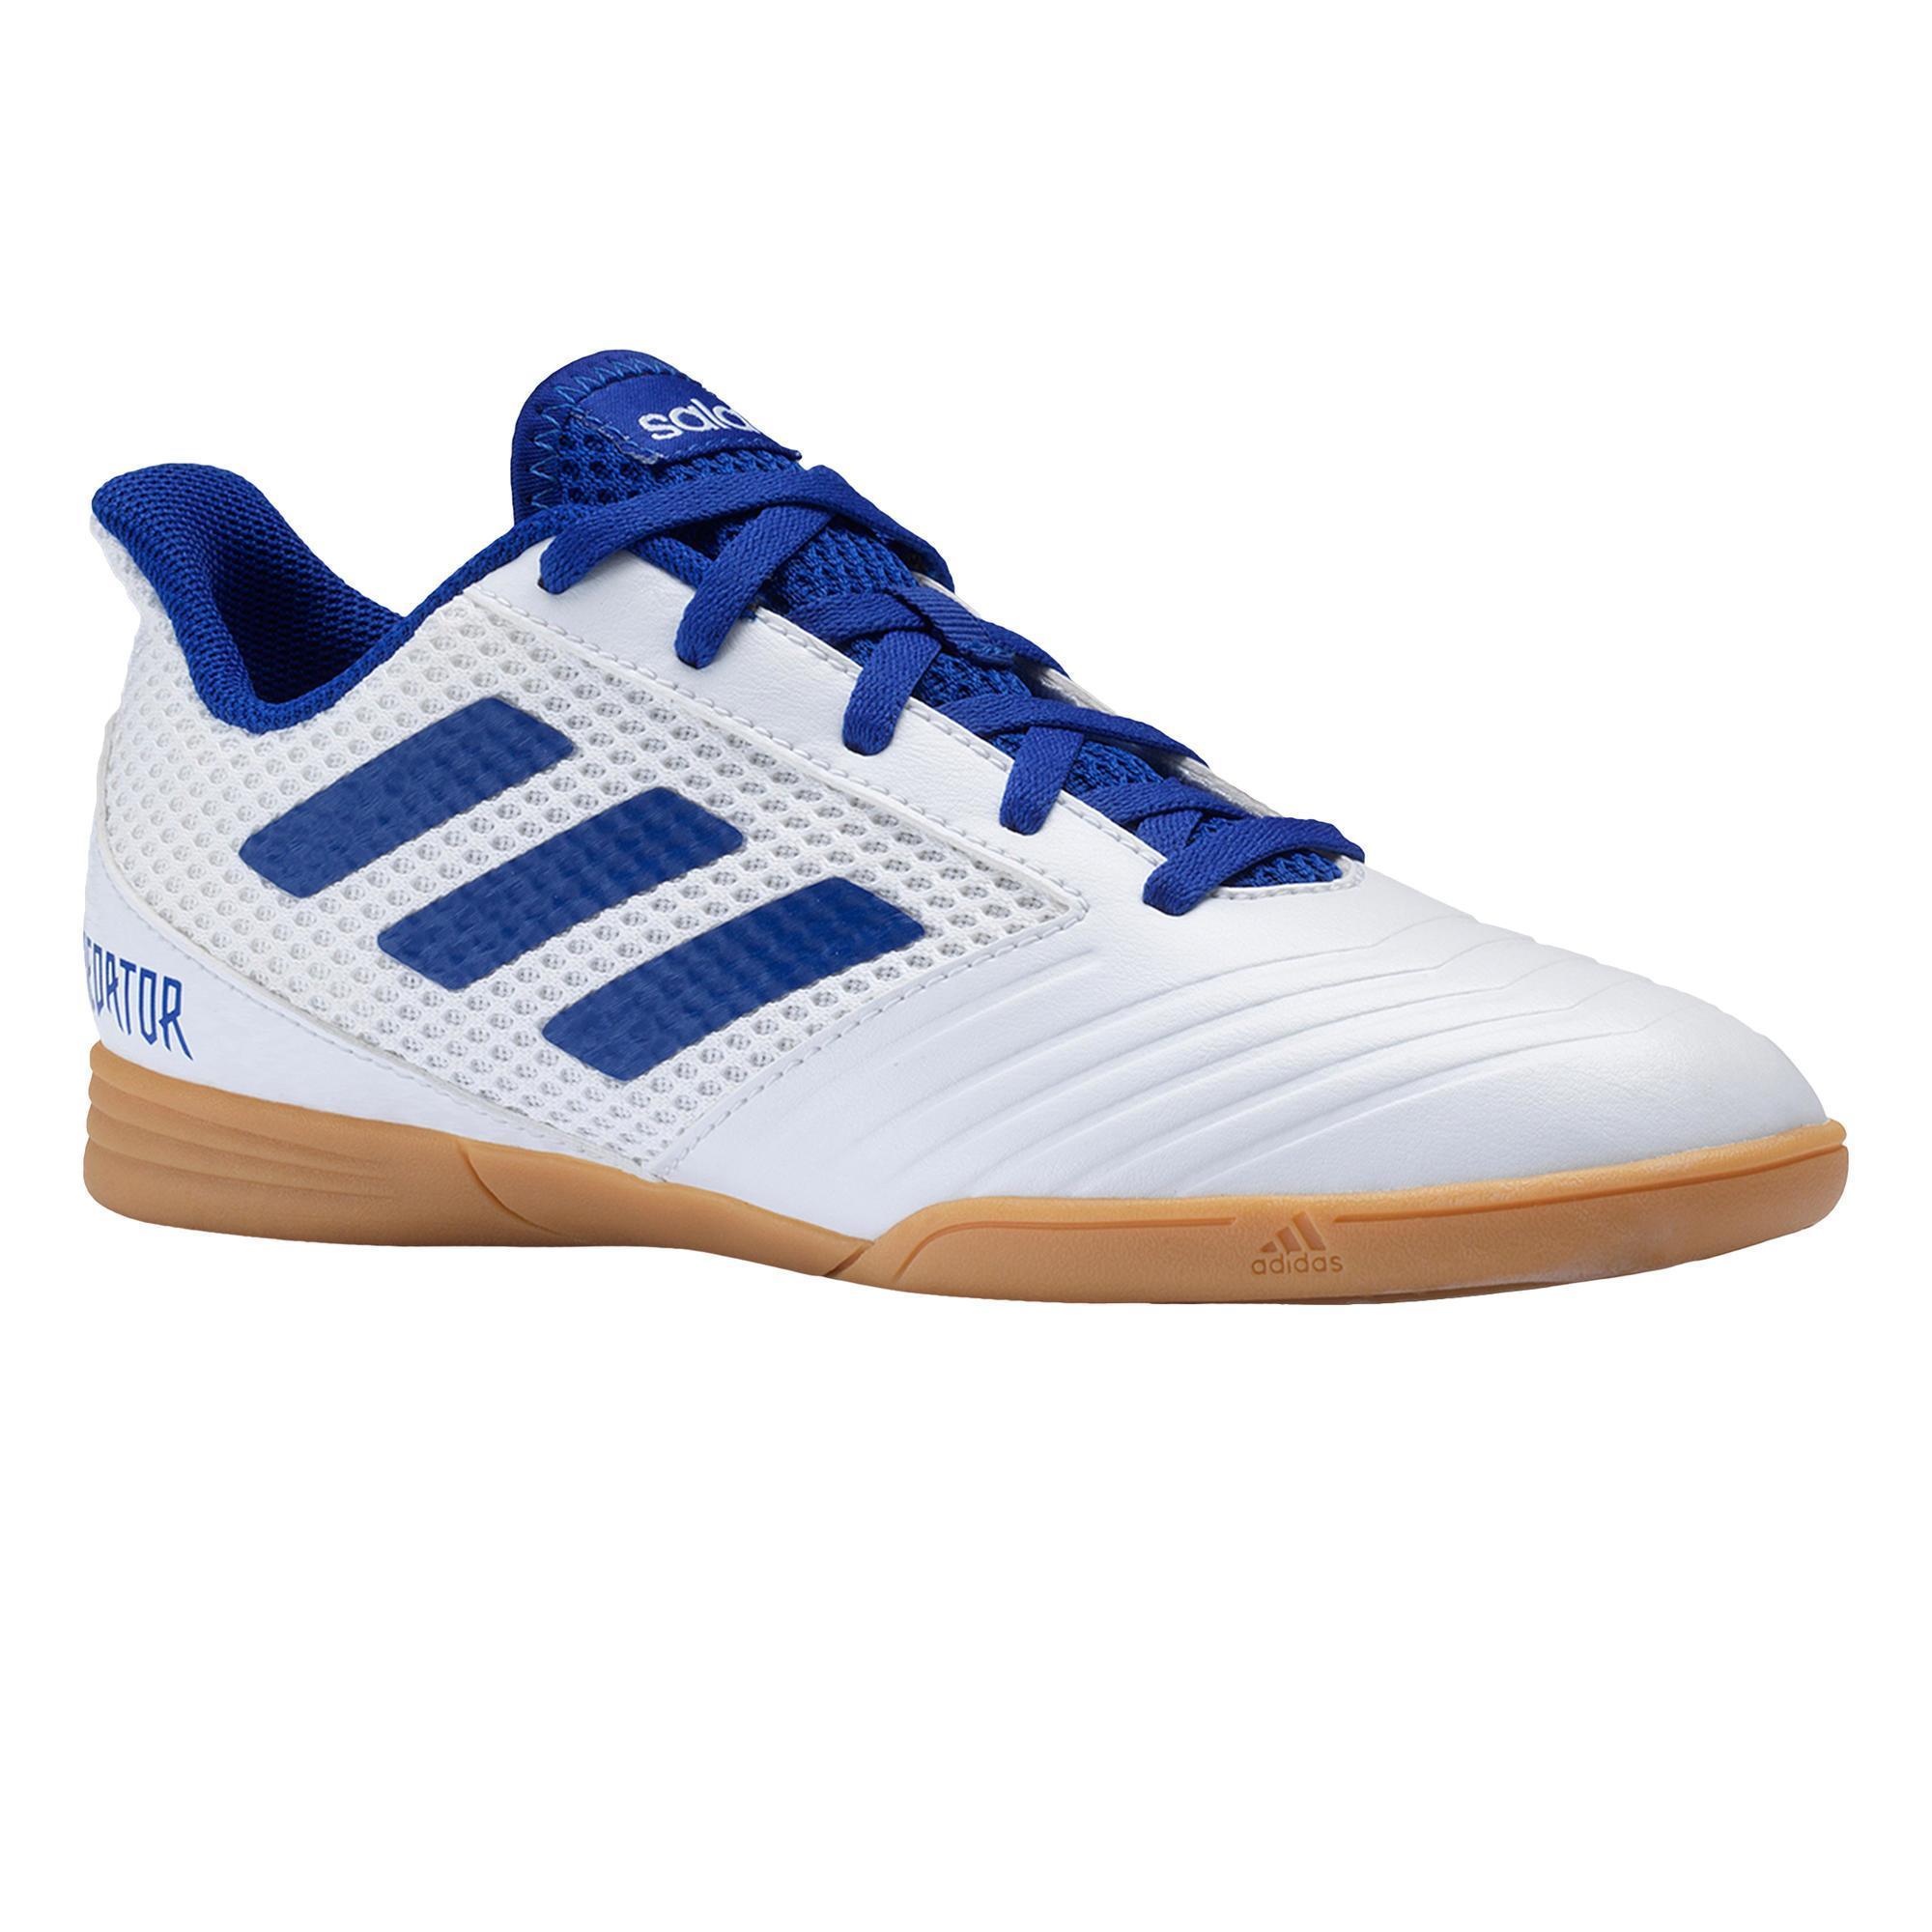 Adidas Zaalvoetbalschoenen kind Predator Tango 19.4 wit/blauw